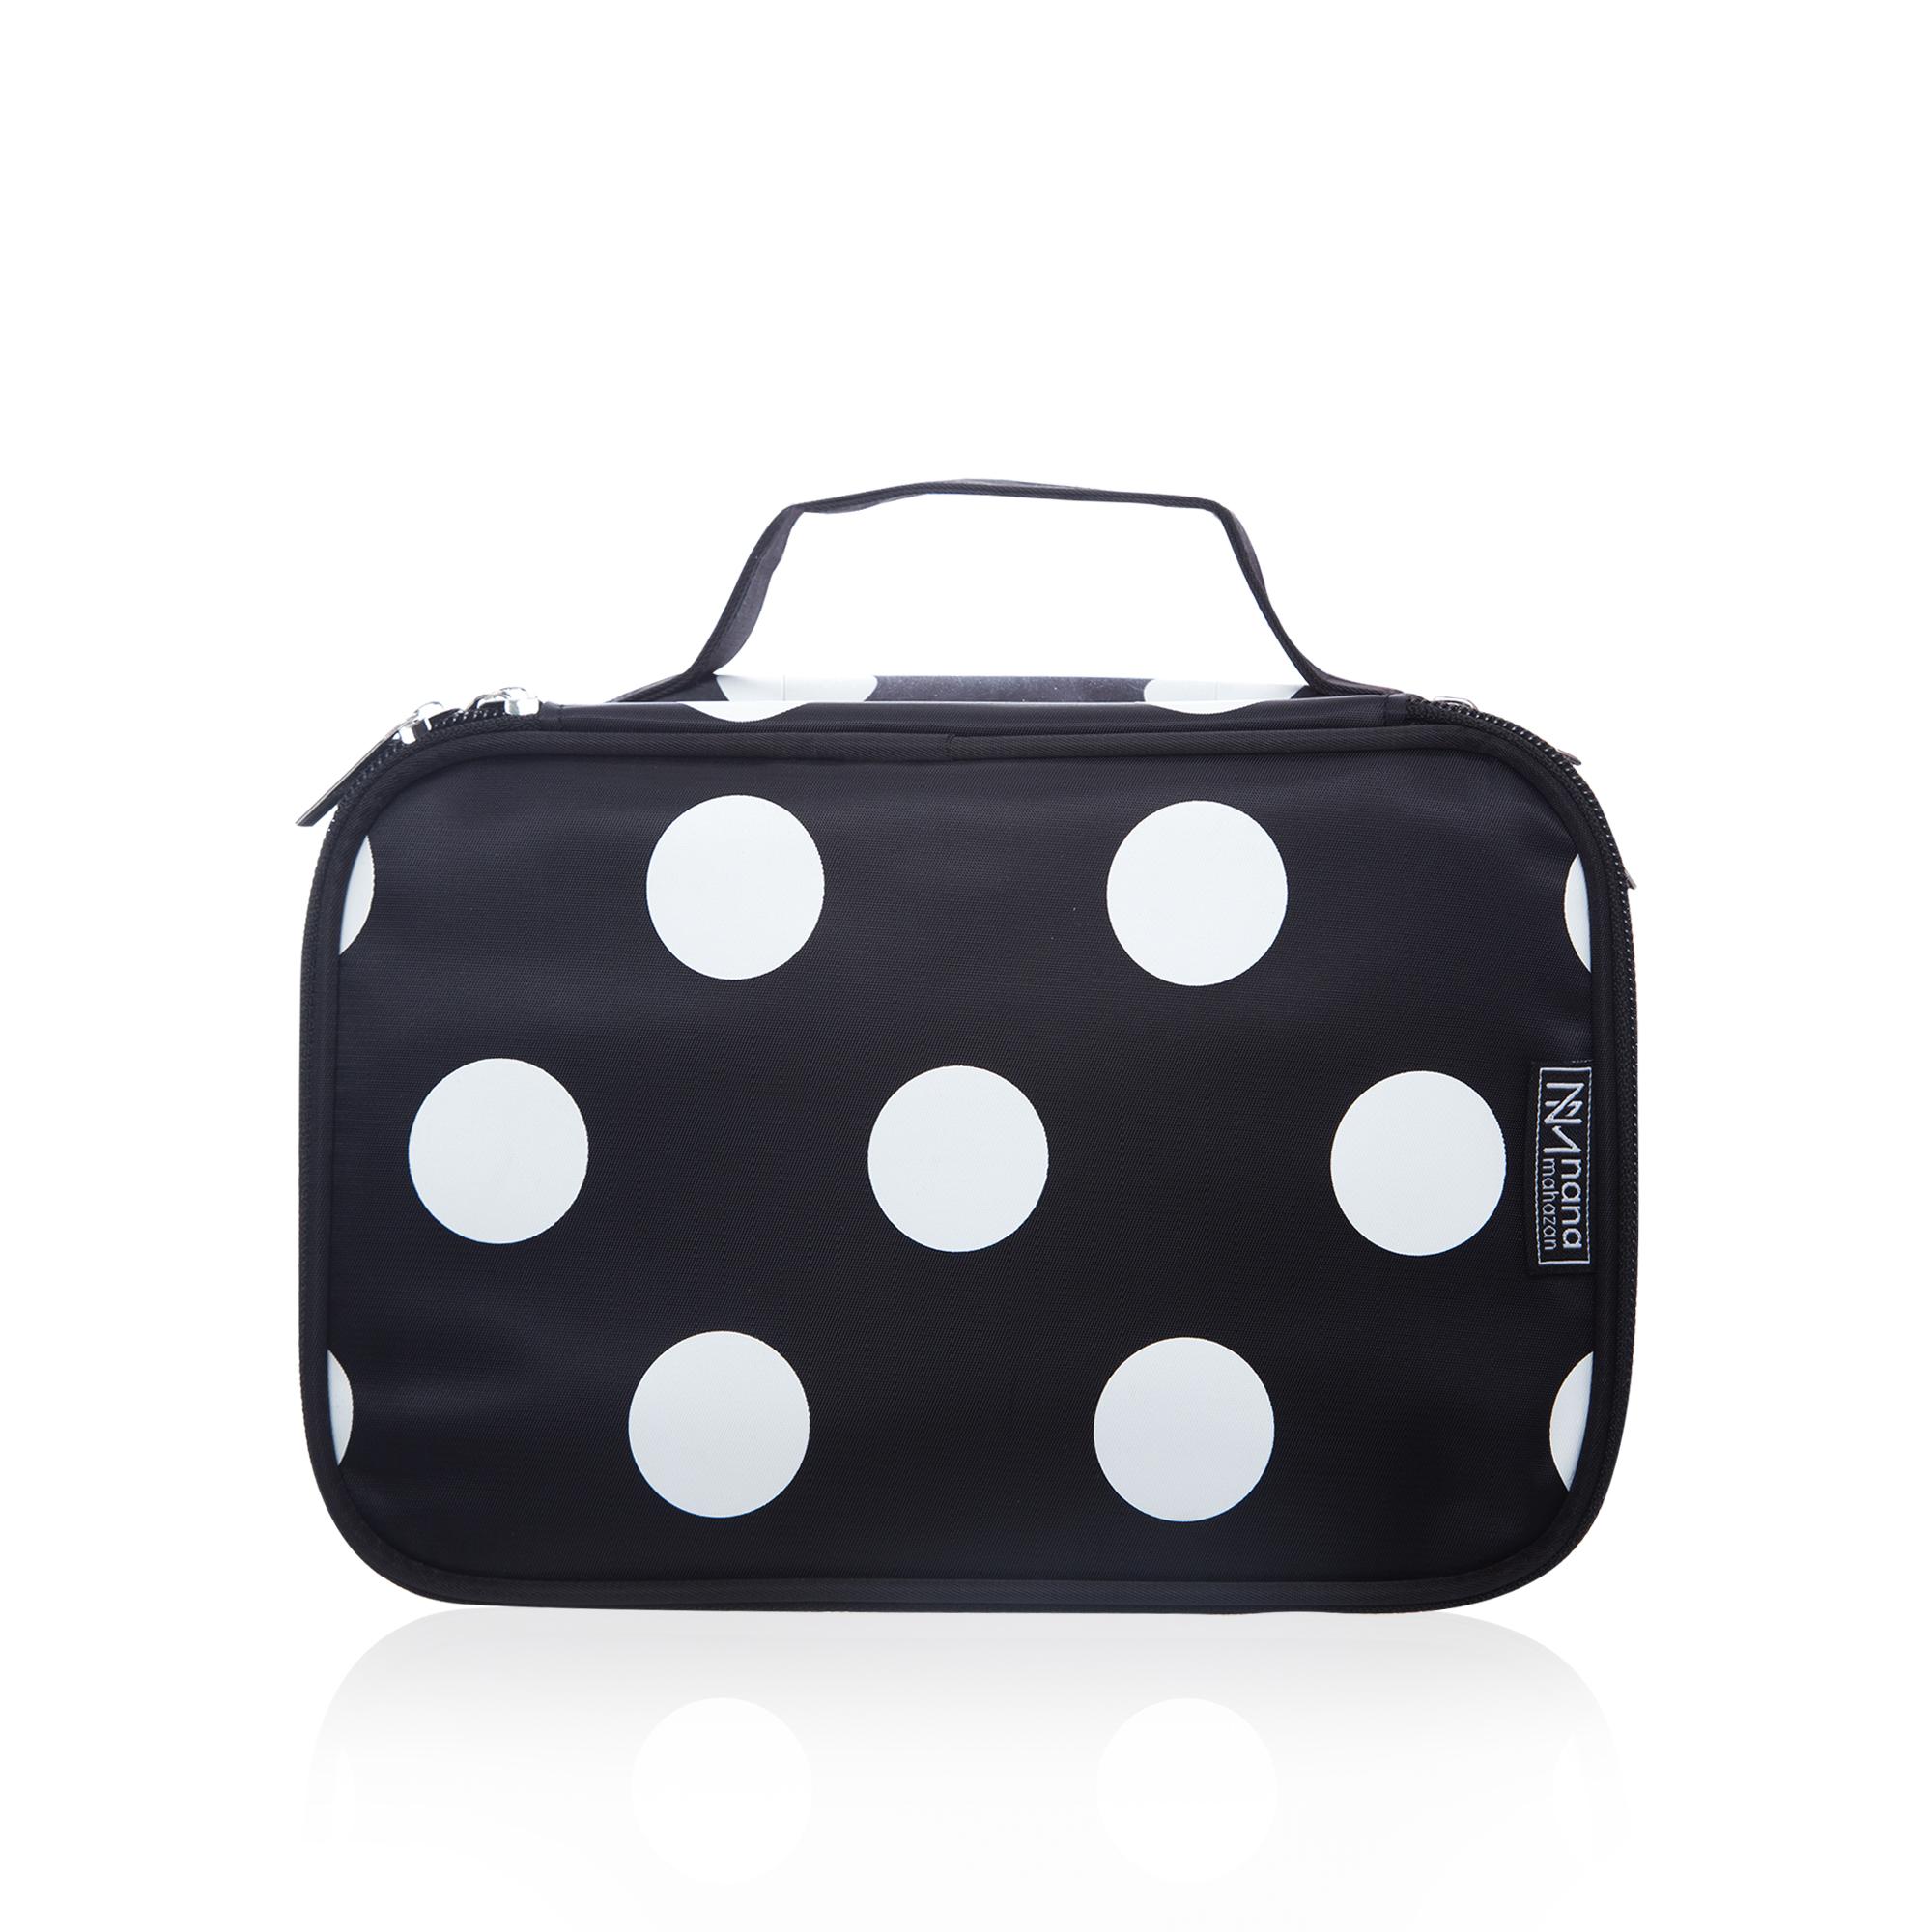 Makeup Bag Double Layer Zipper (Polkadot)